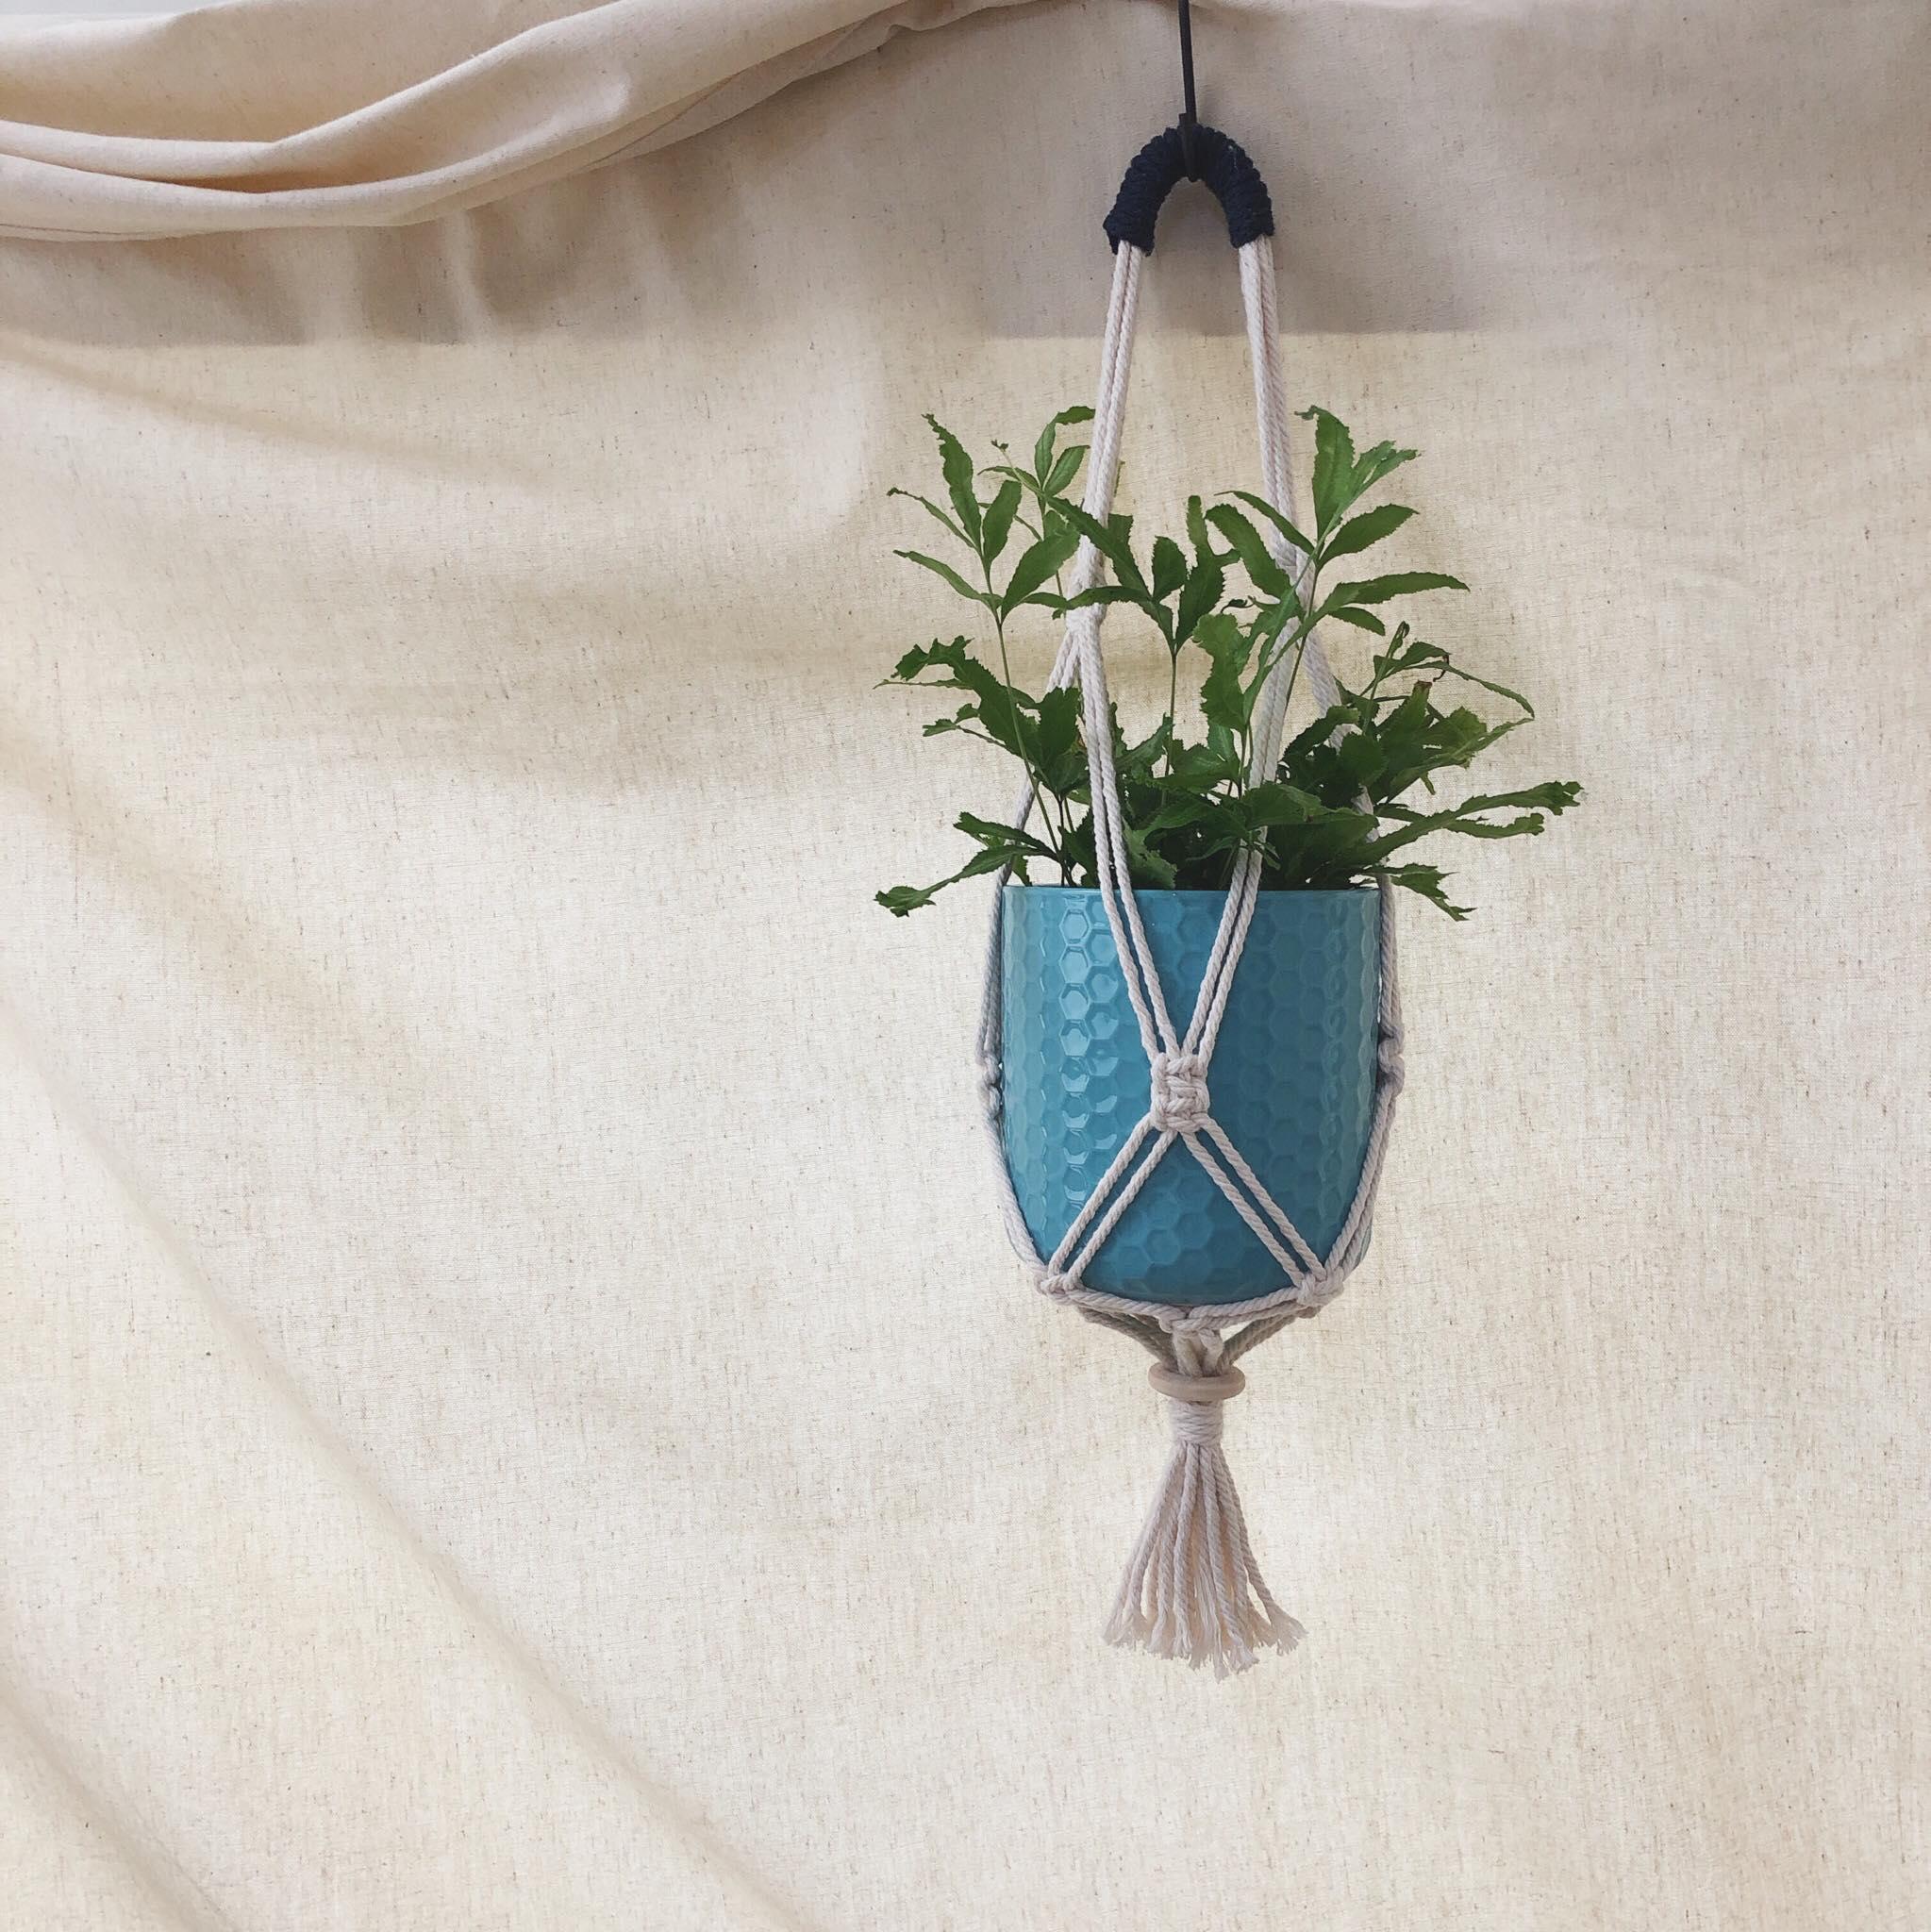 | macramé 花編結 手編容器提袋 |  以花編結製作提袋,可依您需求放置, 盆栽、水果、水壺、便當盒等容器~  時間 | 13:00-15:00 地點 | · 療 物 販 · 攤位